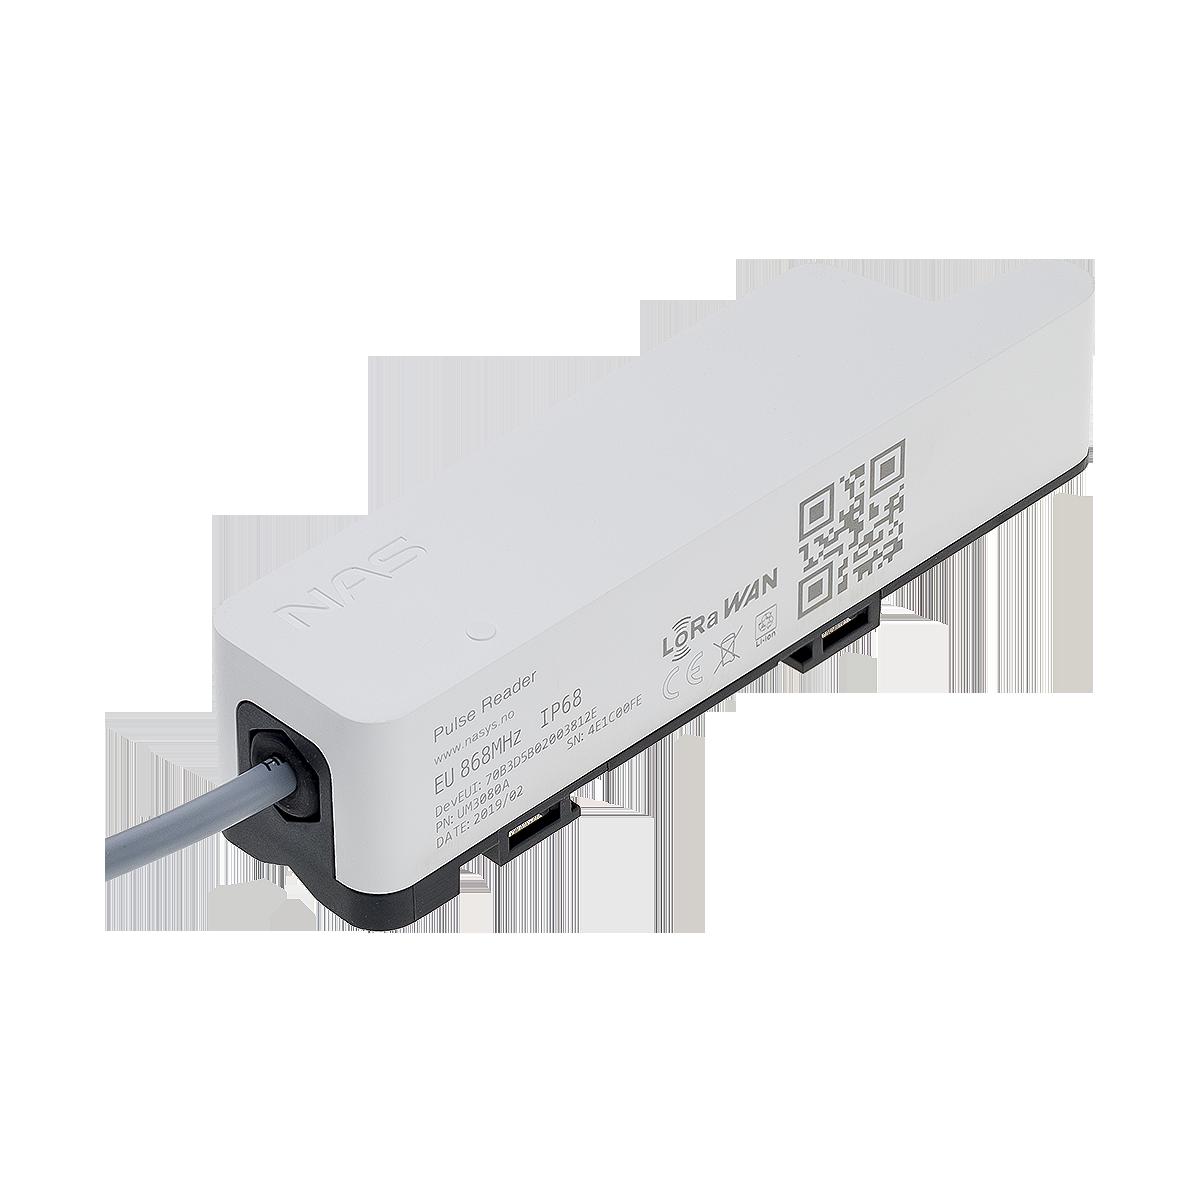 Pulse Reader UM3080